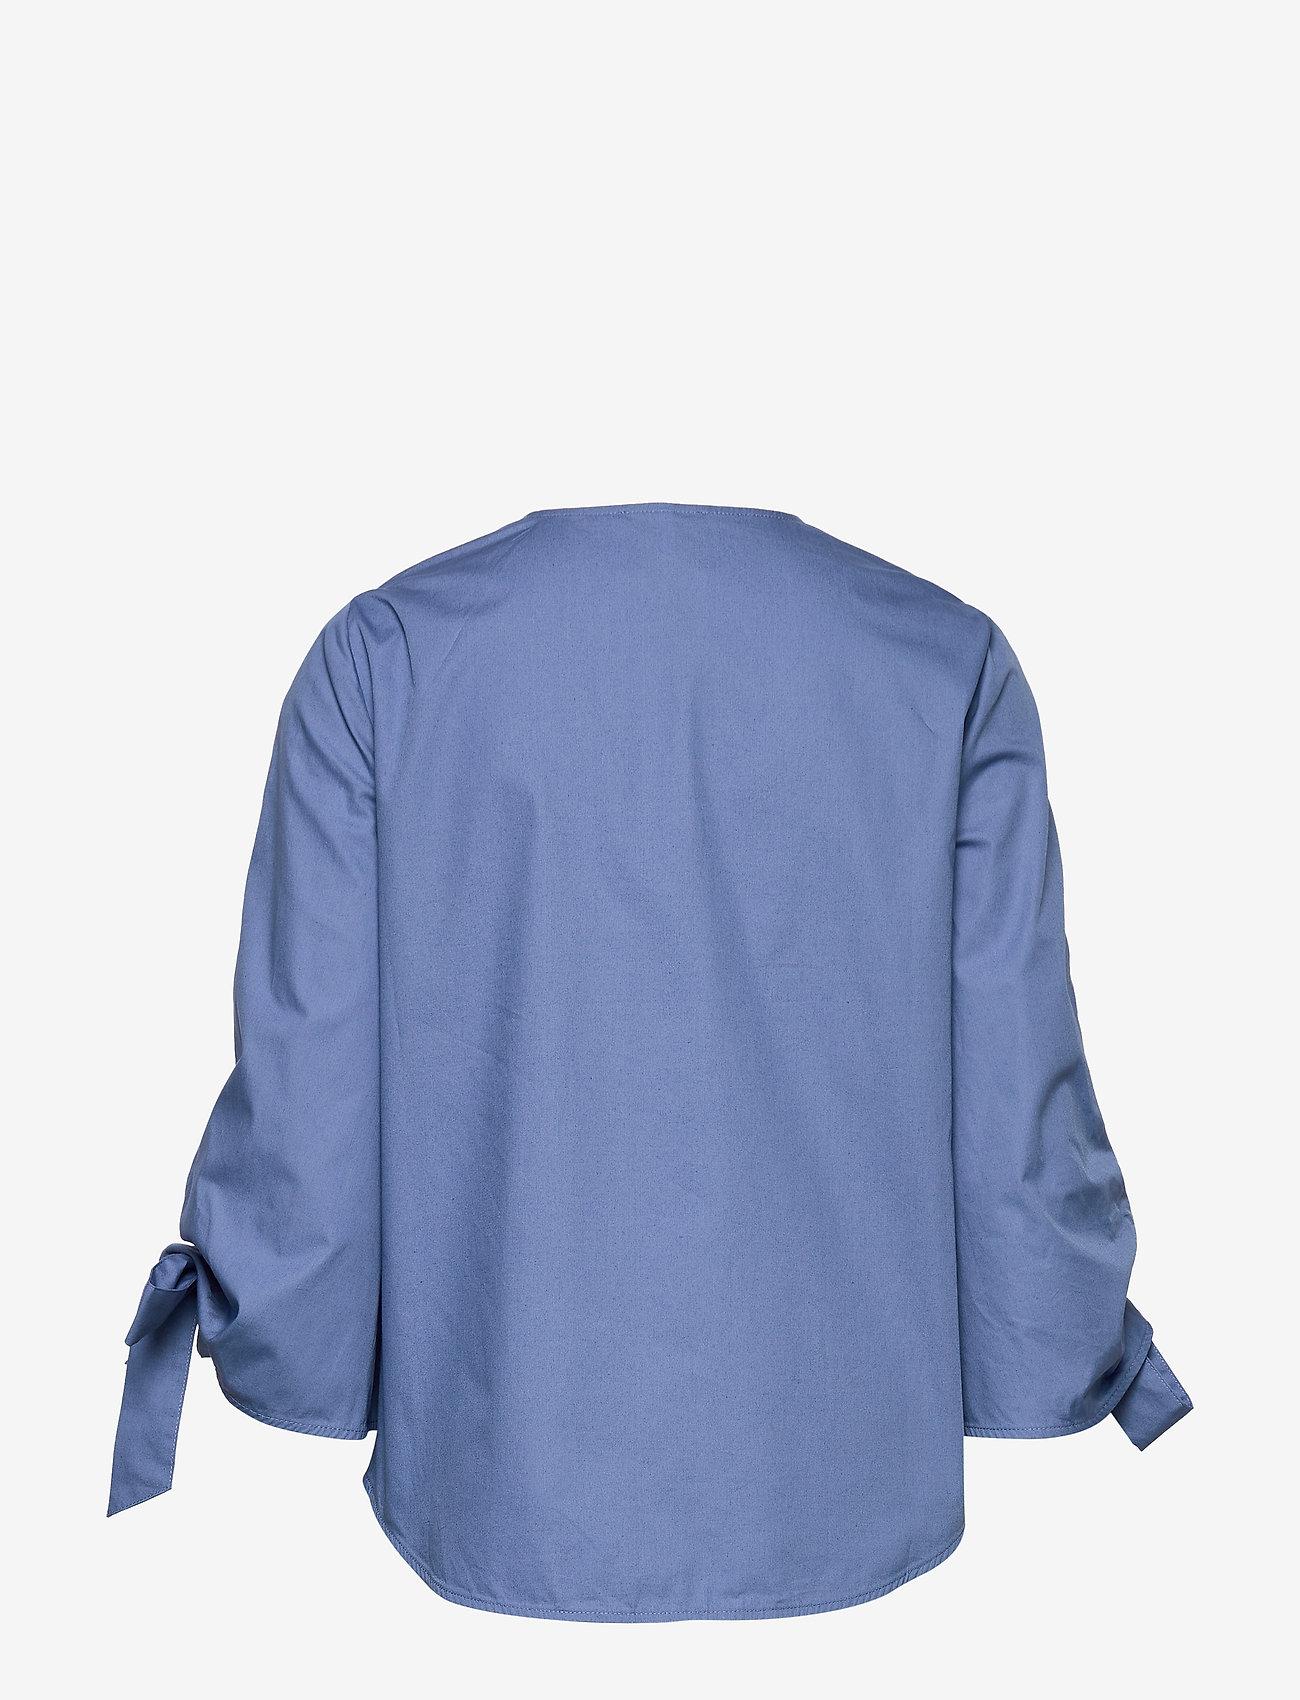 Just Female - Majken blouse - långärmade blusar - riverside - 1